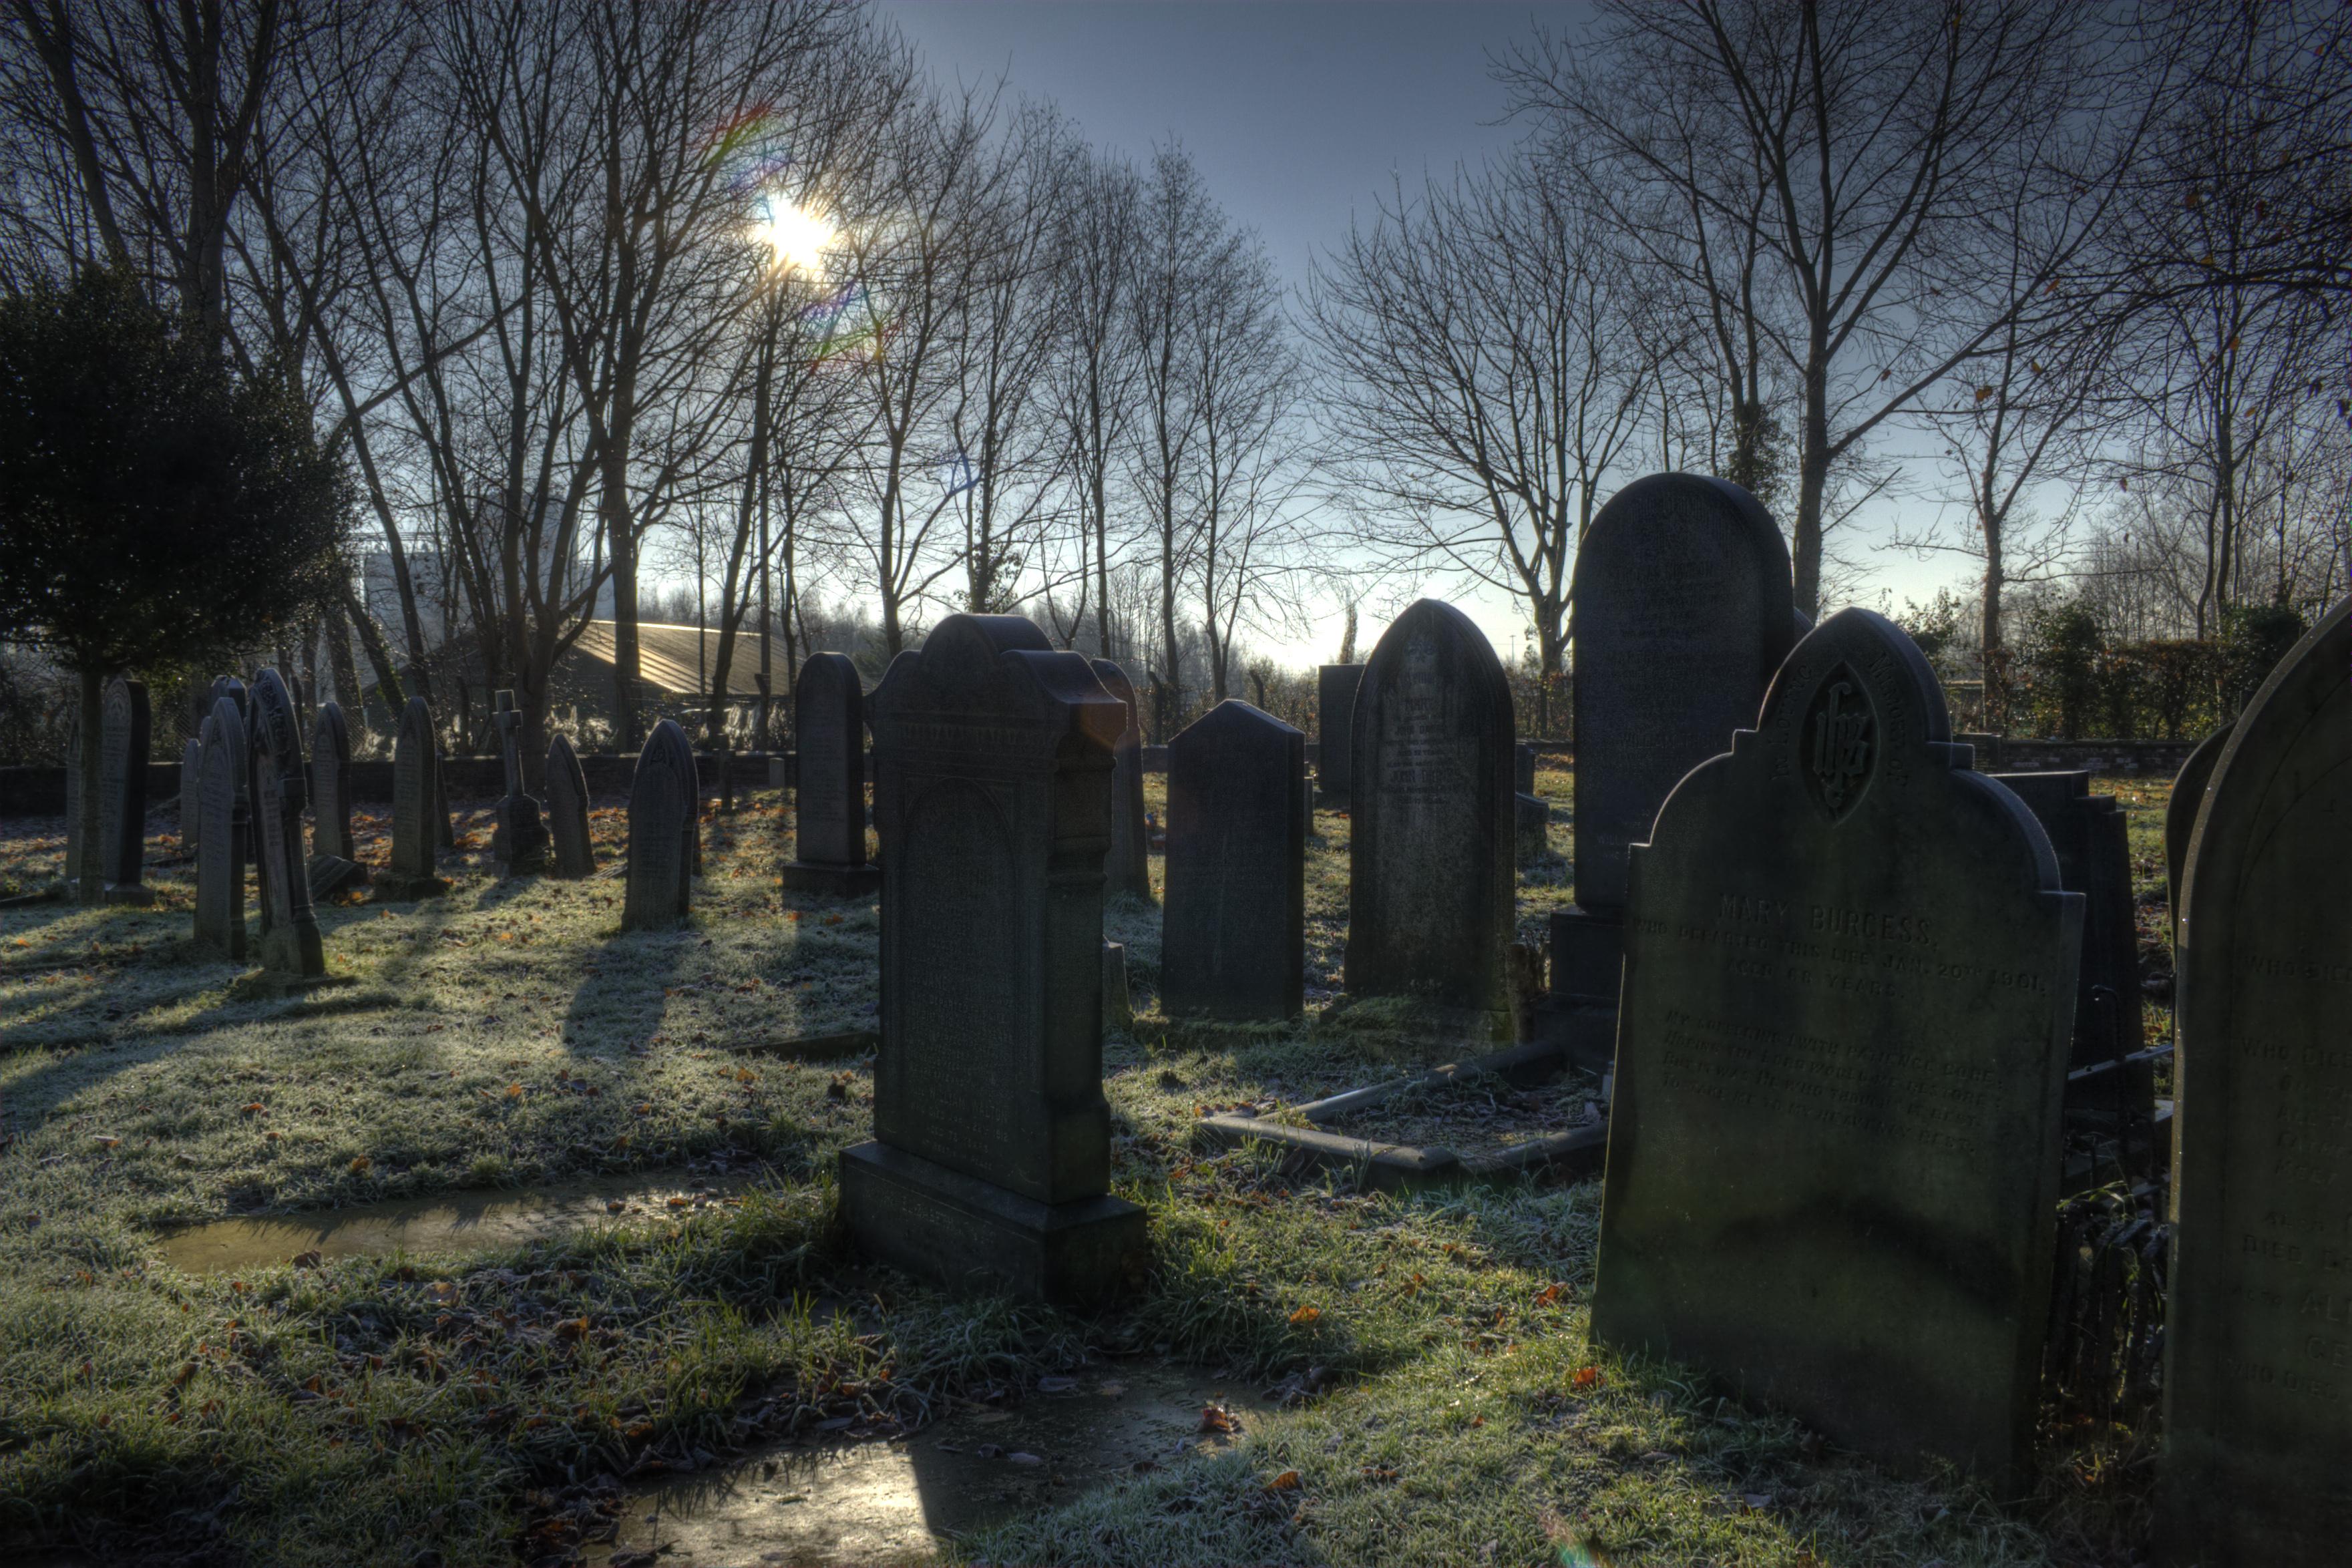 Школа на кладбище. Как вам такое?